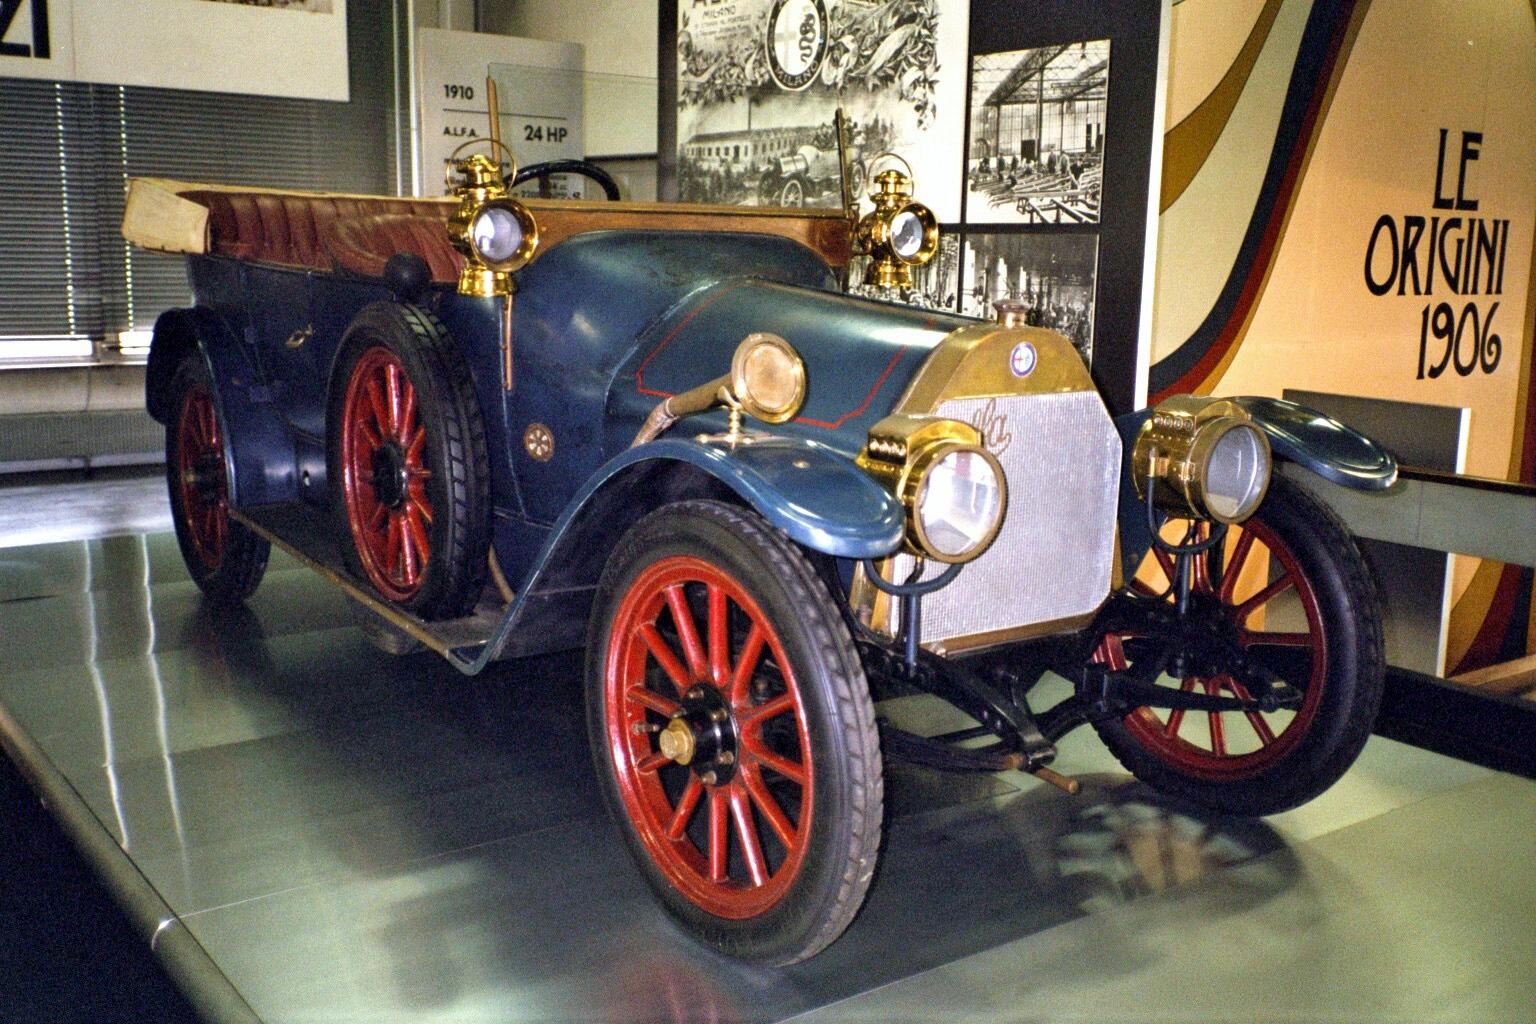 A.L.F.A 24 hp